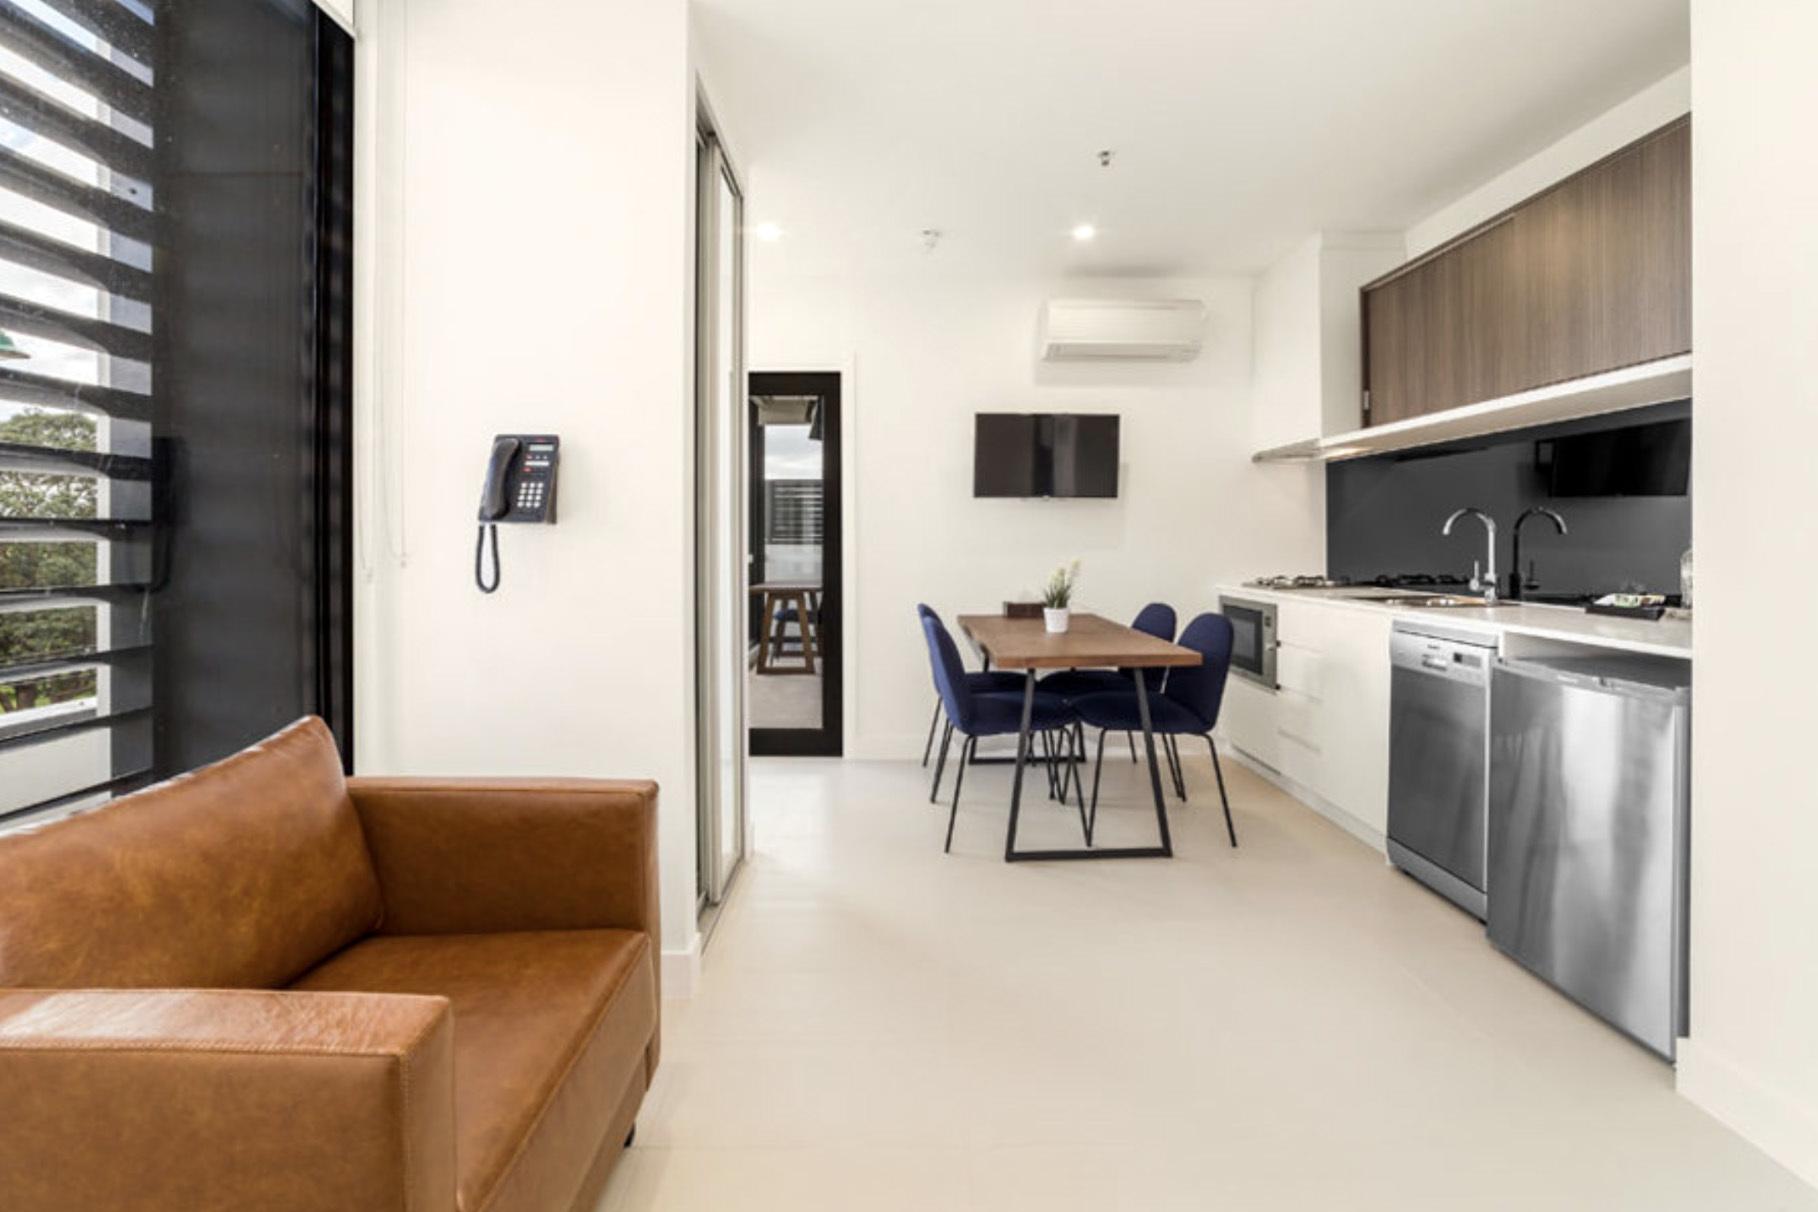 b - Whitehorse Apartments Hotel